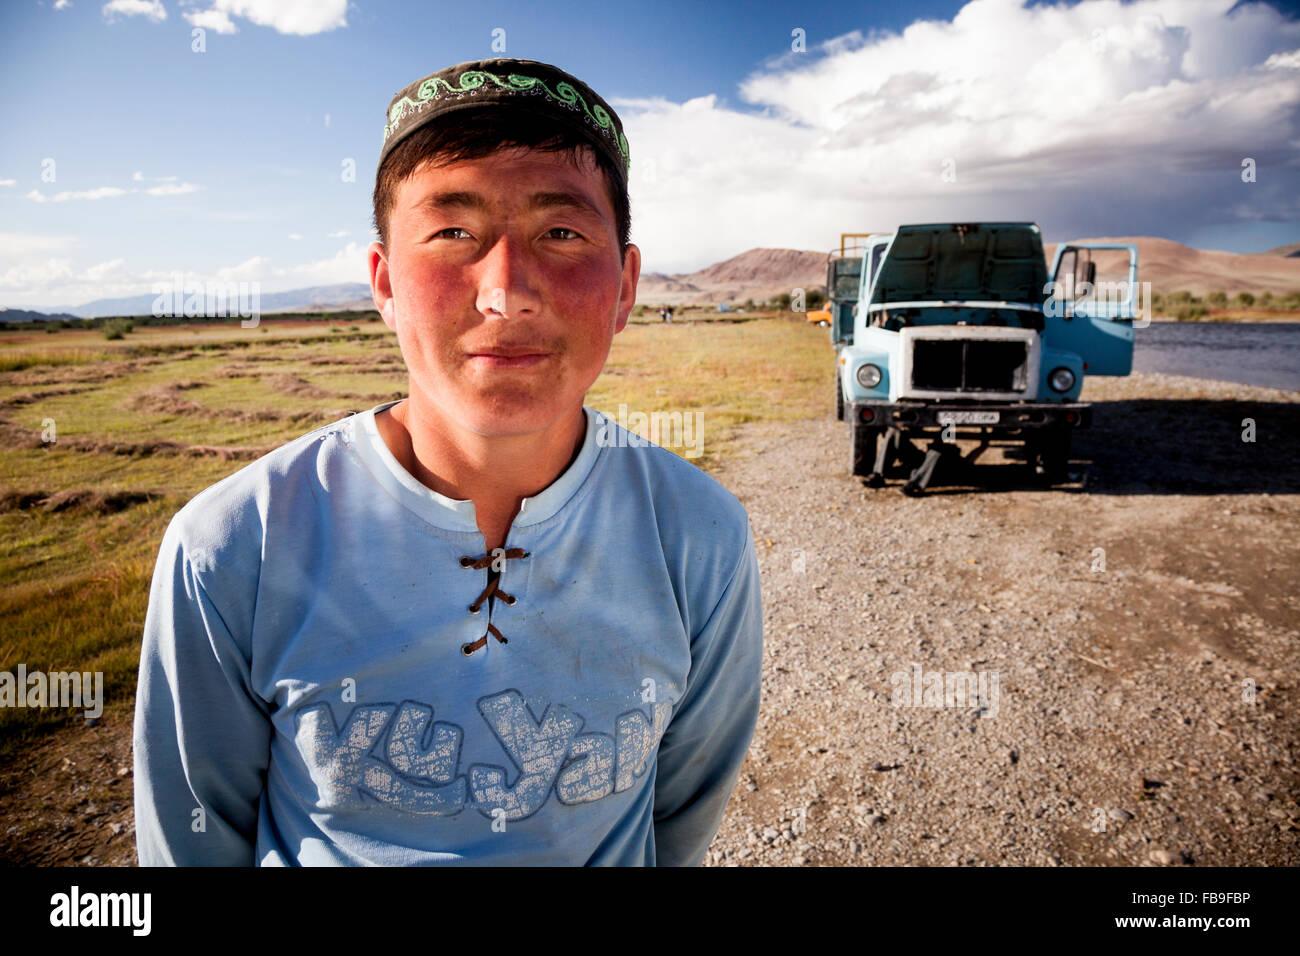 Impromptu truck repairs after a breakdown in Bayan-Ölgii province, Mongolia. - Stock Image